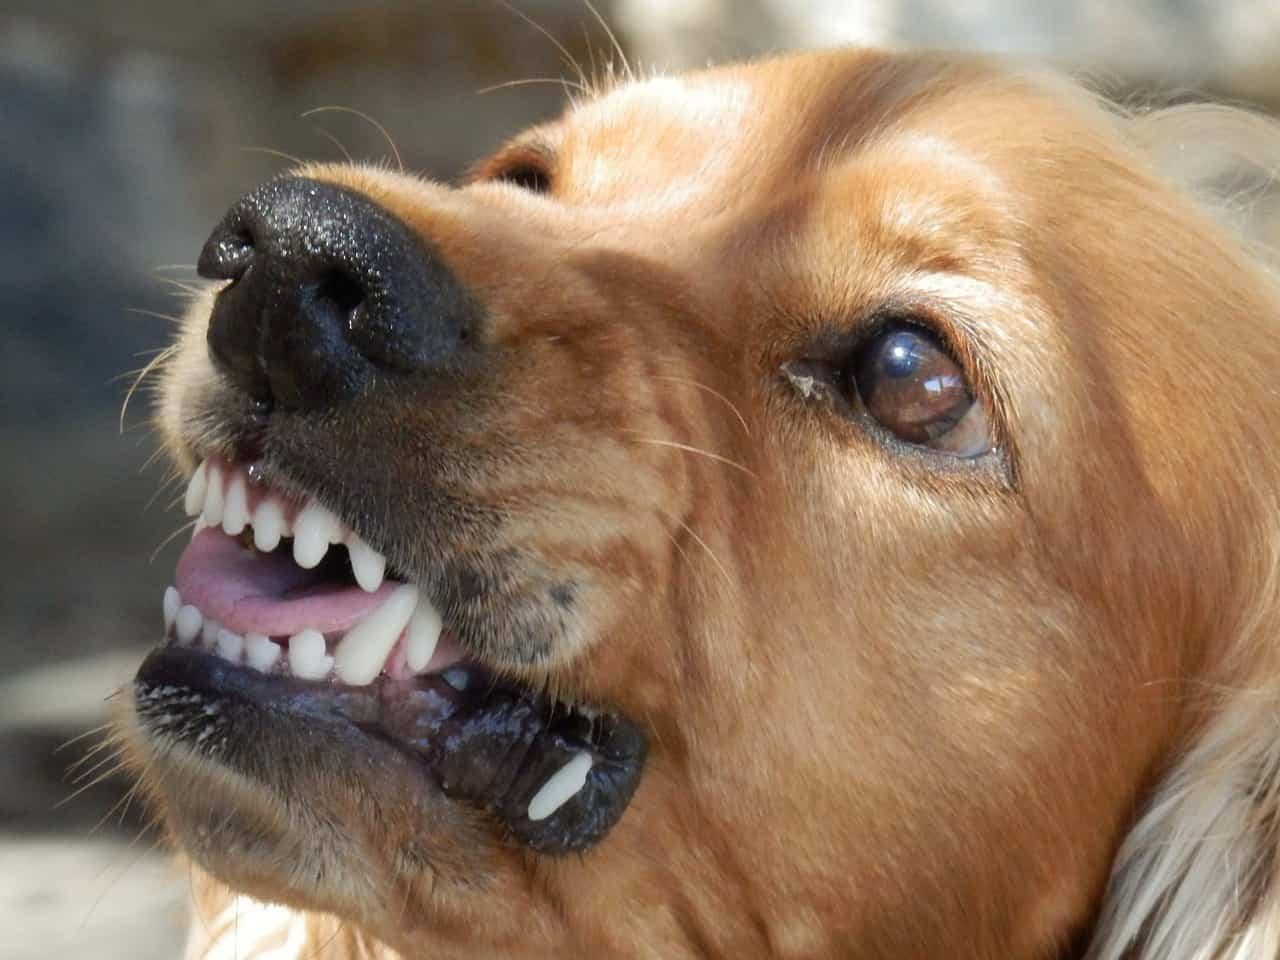 Canine Aggression and Predation